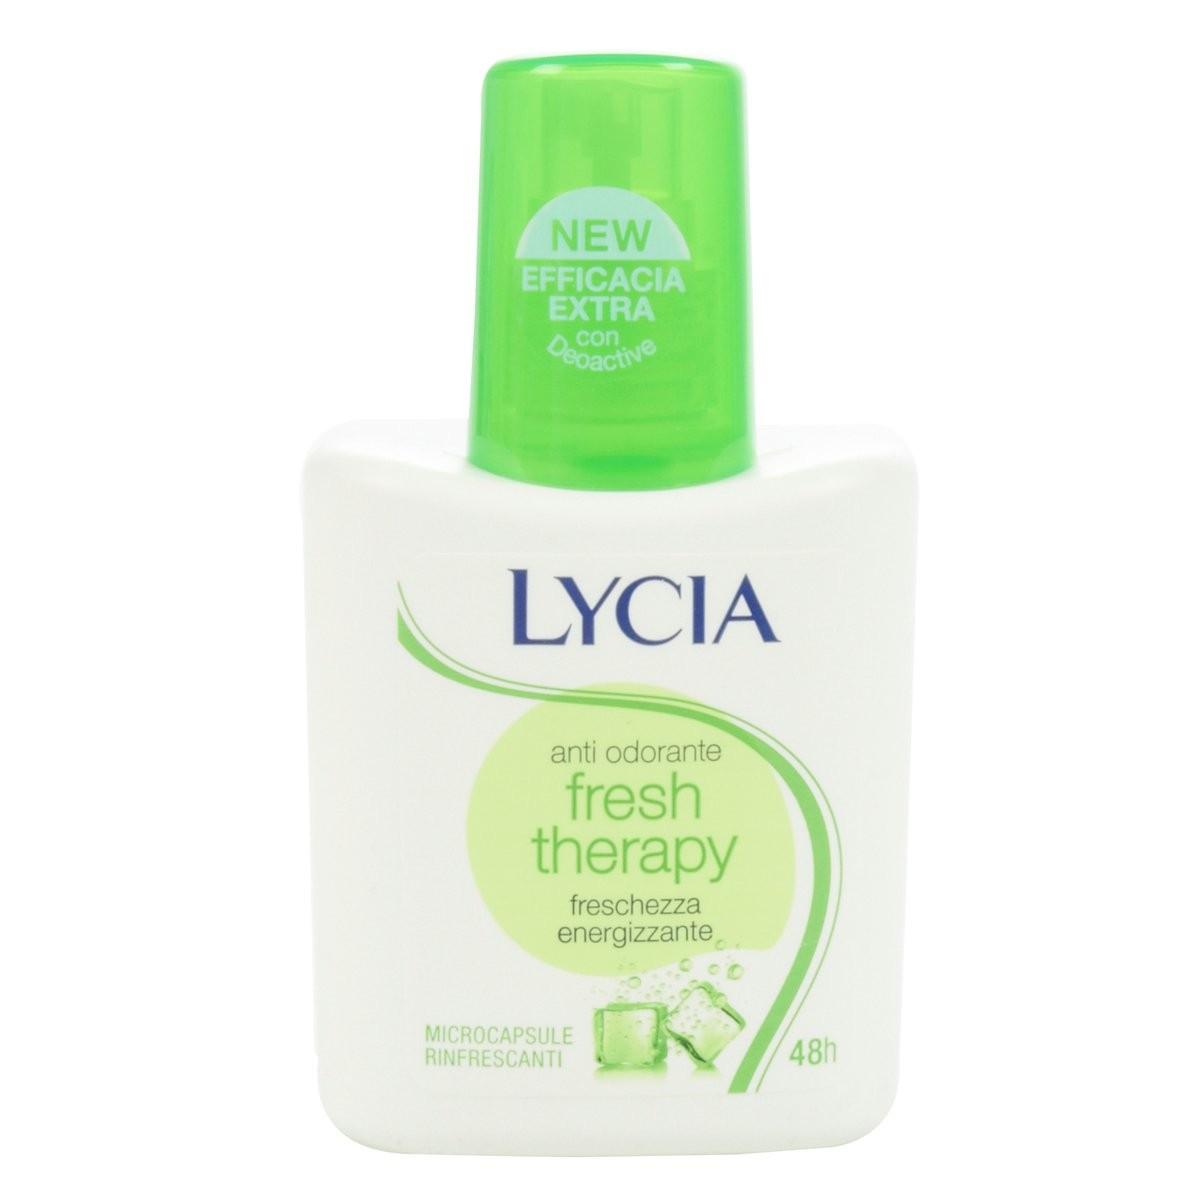 Lycia Deodorante spray Fresco